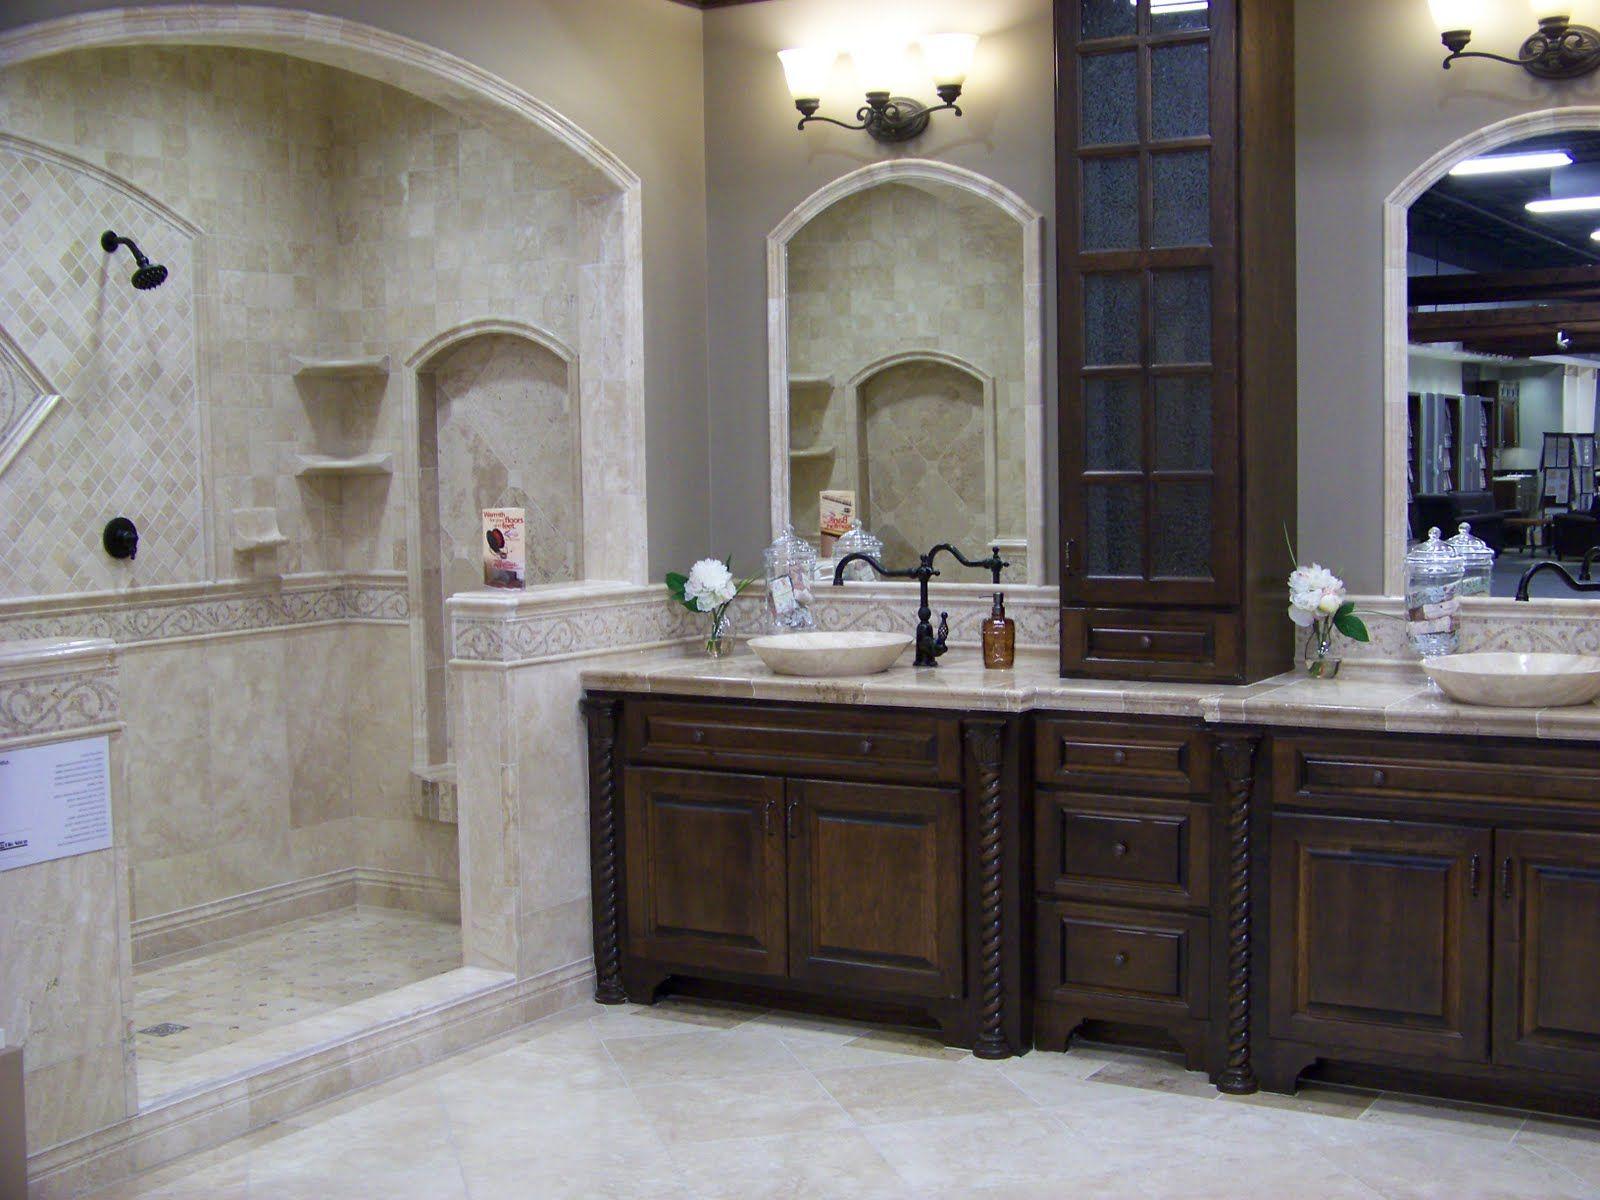 Home Decor Budgetista Bathroom Inspiration The Tile